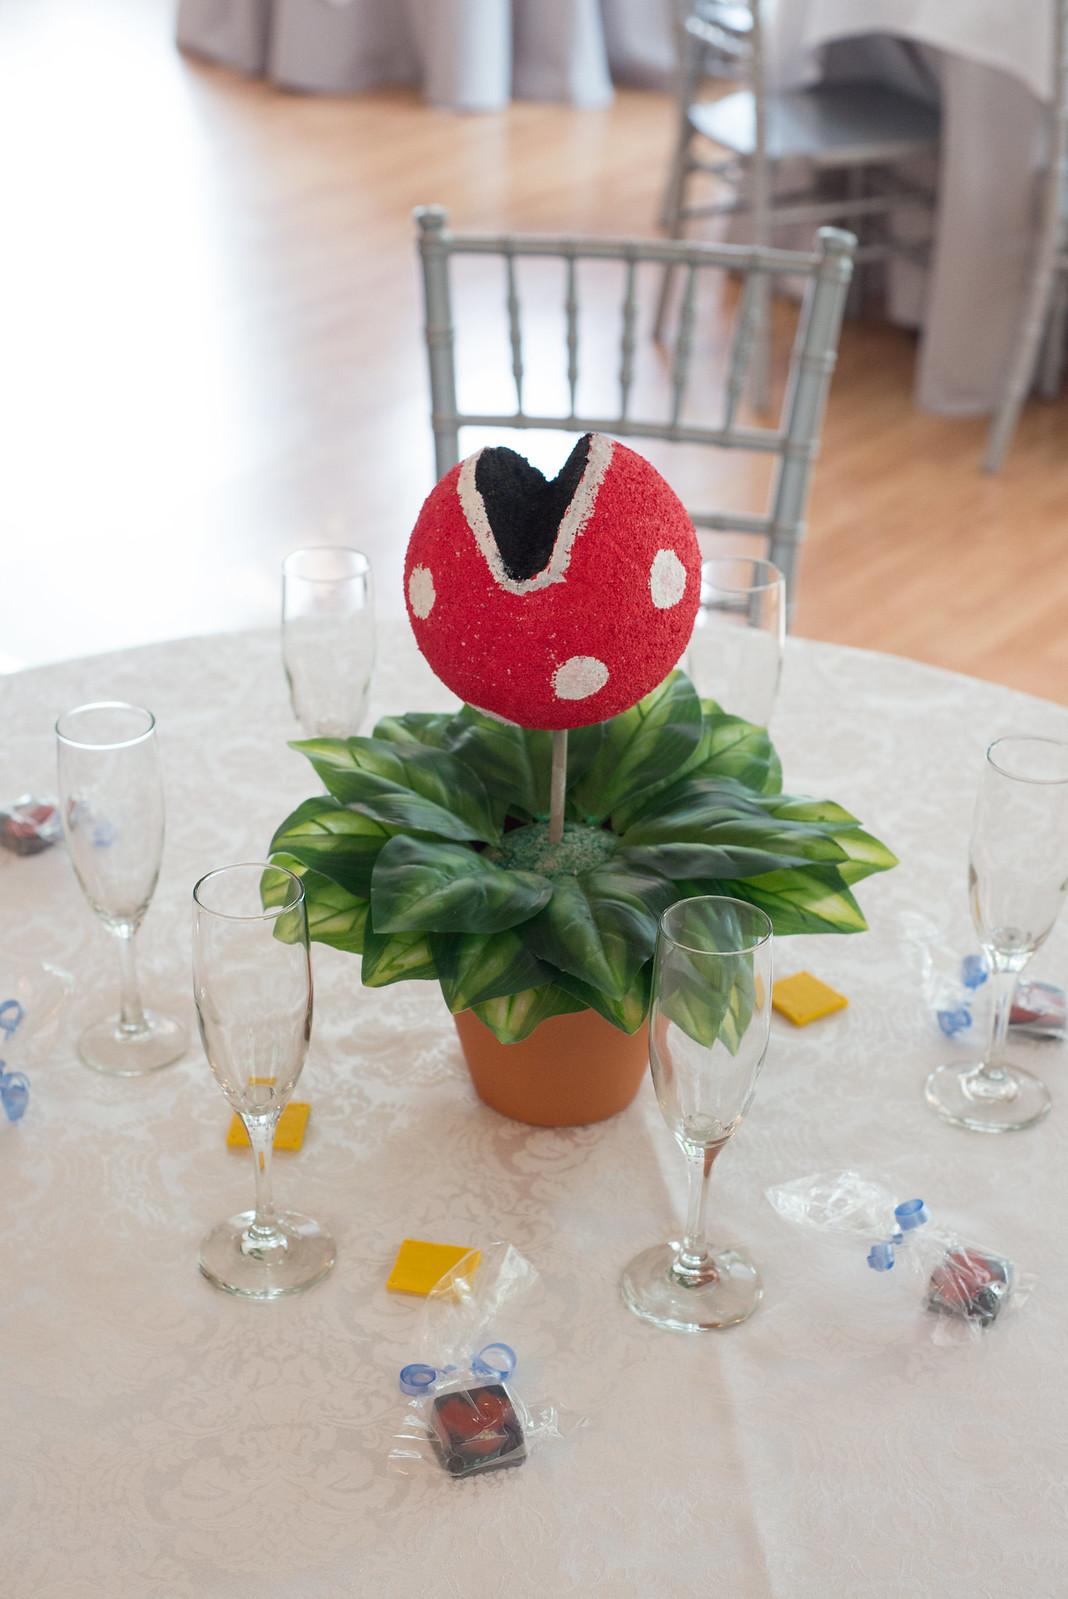 Super Mario Bros. Piranha Plant Centerpiece